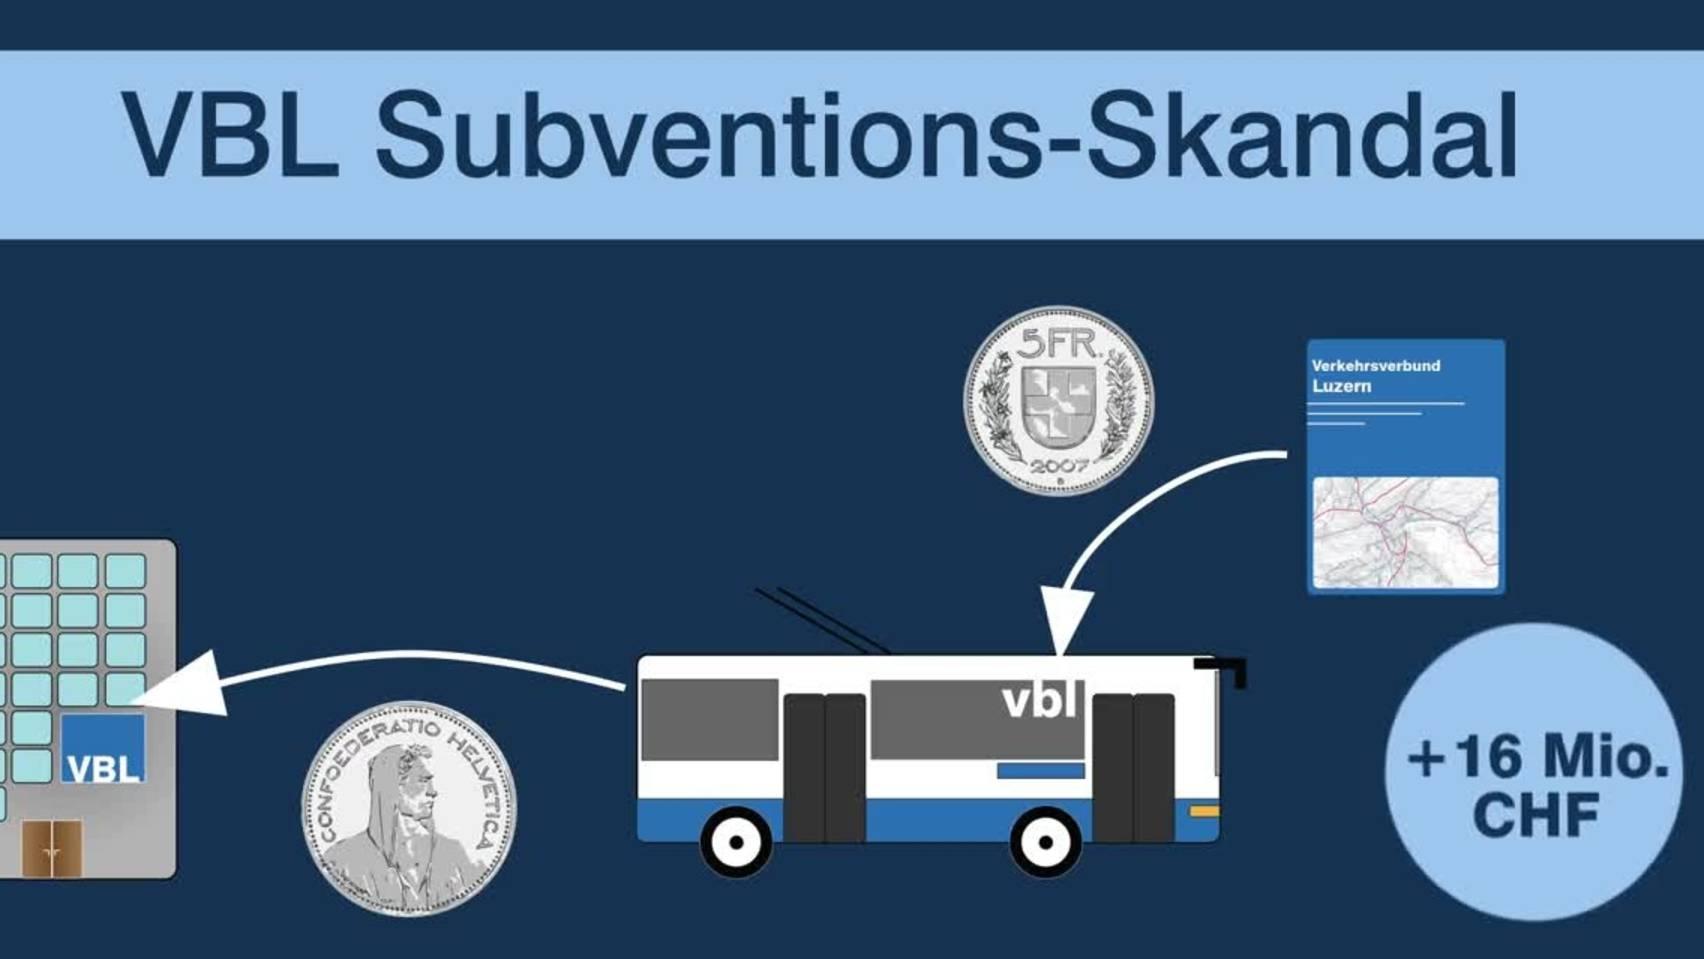 Thumb for ‹Subventionsskandal der vbl›